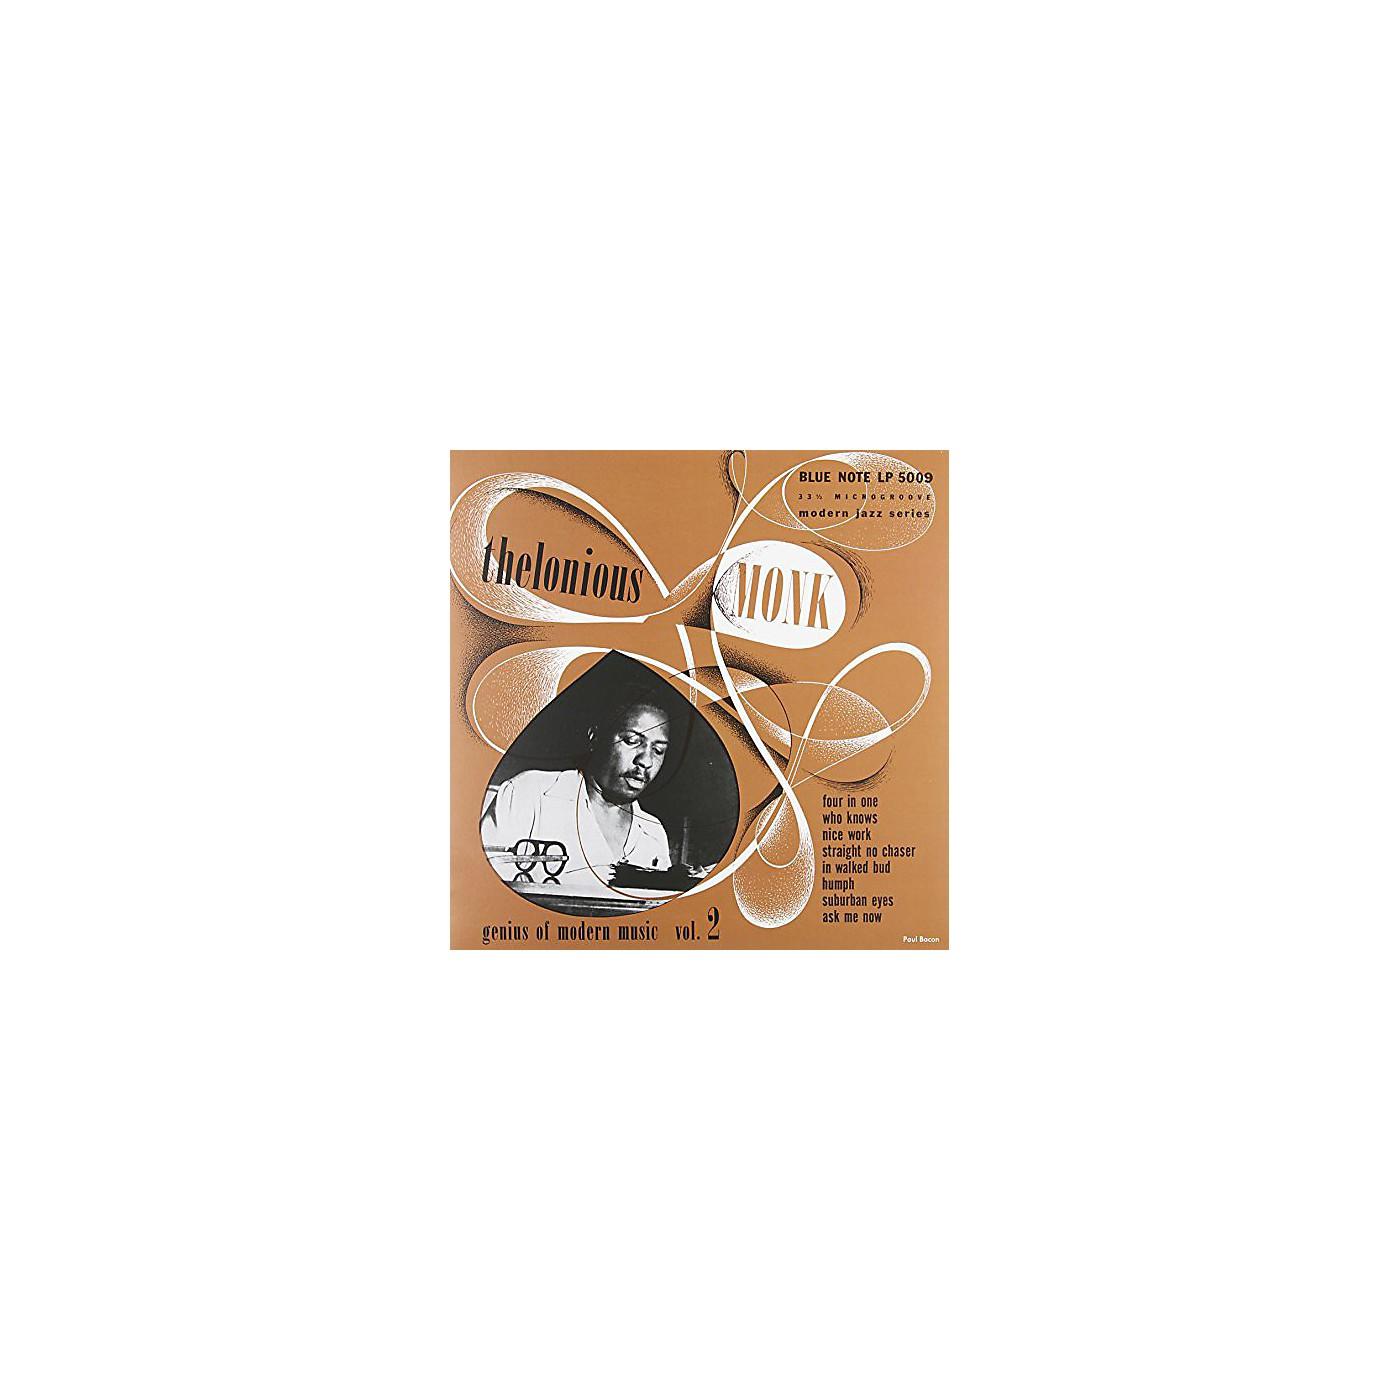 Alliance Thelonious Monk - Genius of Modern Music 2 thumbnail